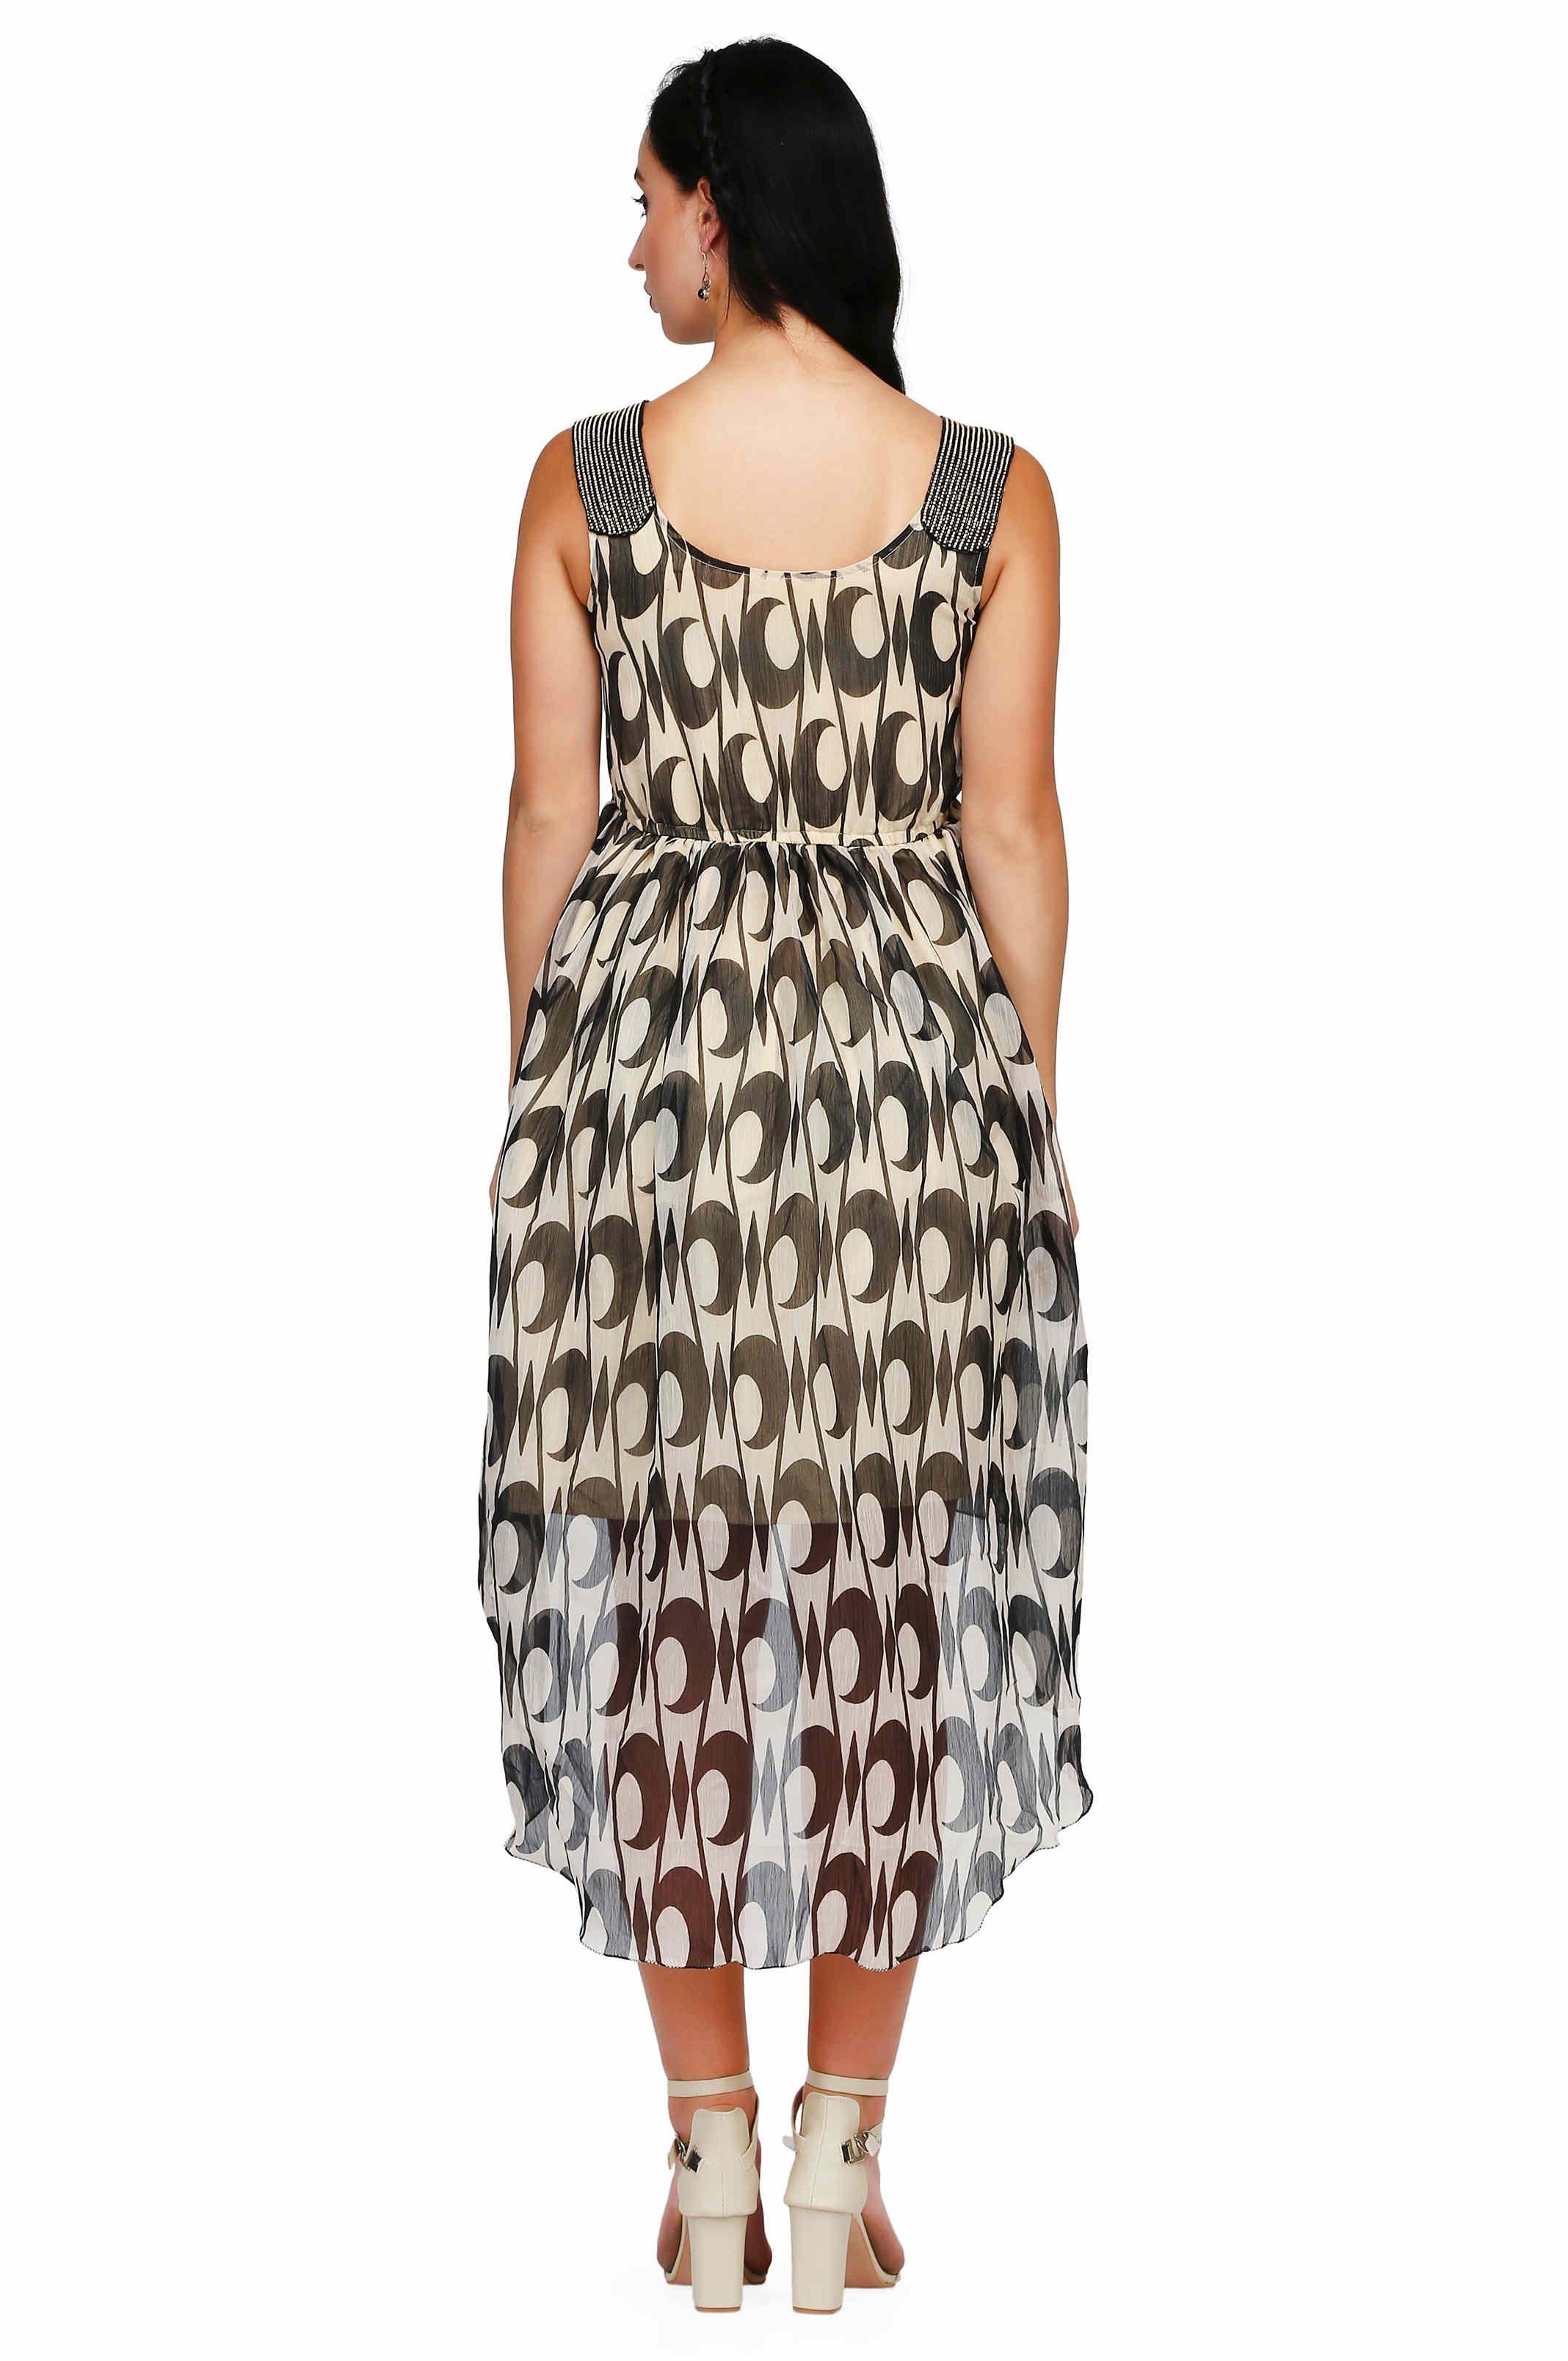 4bc7331a5735 Pret a Porter Chiffon Beige Dresses Pret a Porter Chiffon Beige Dresses ...